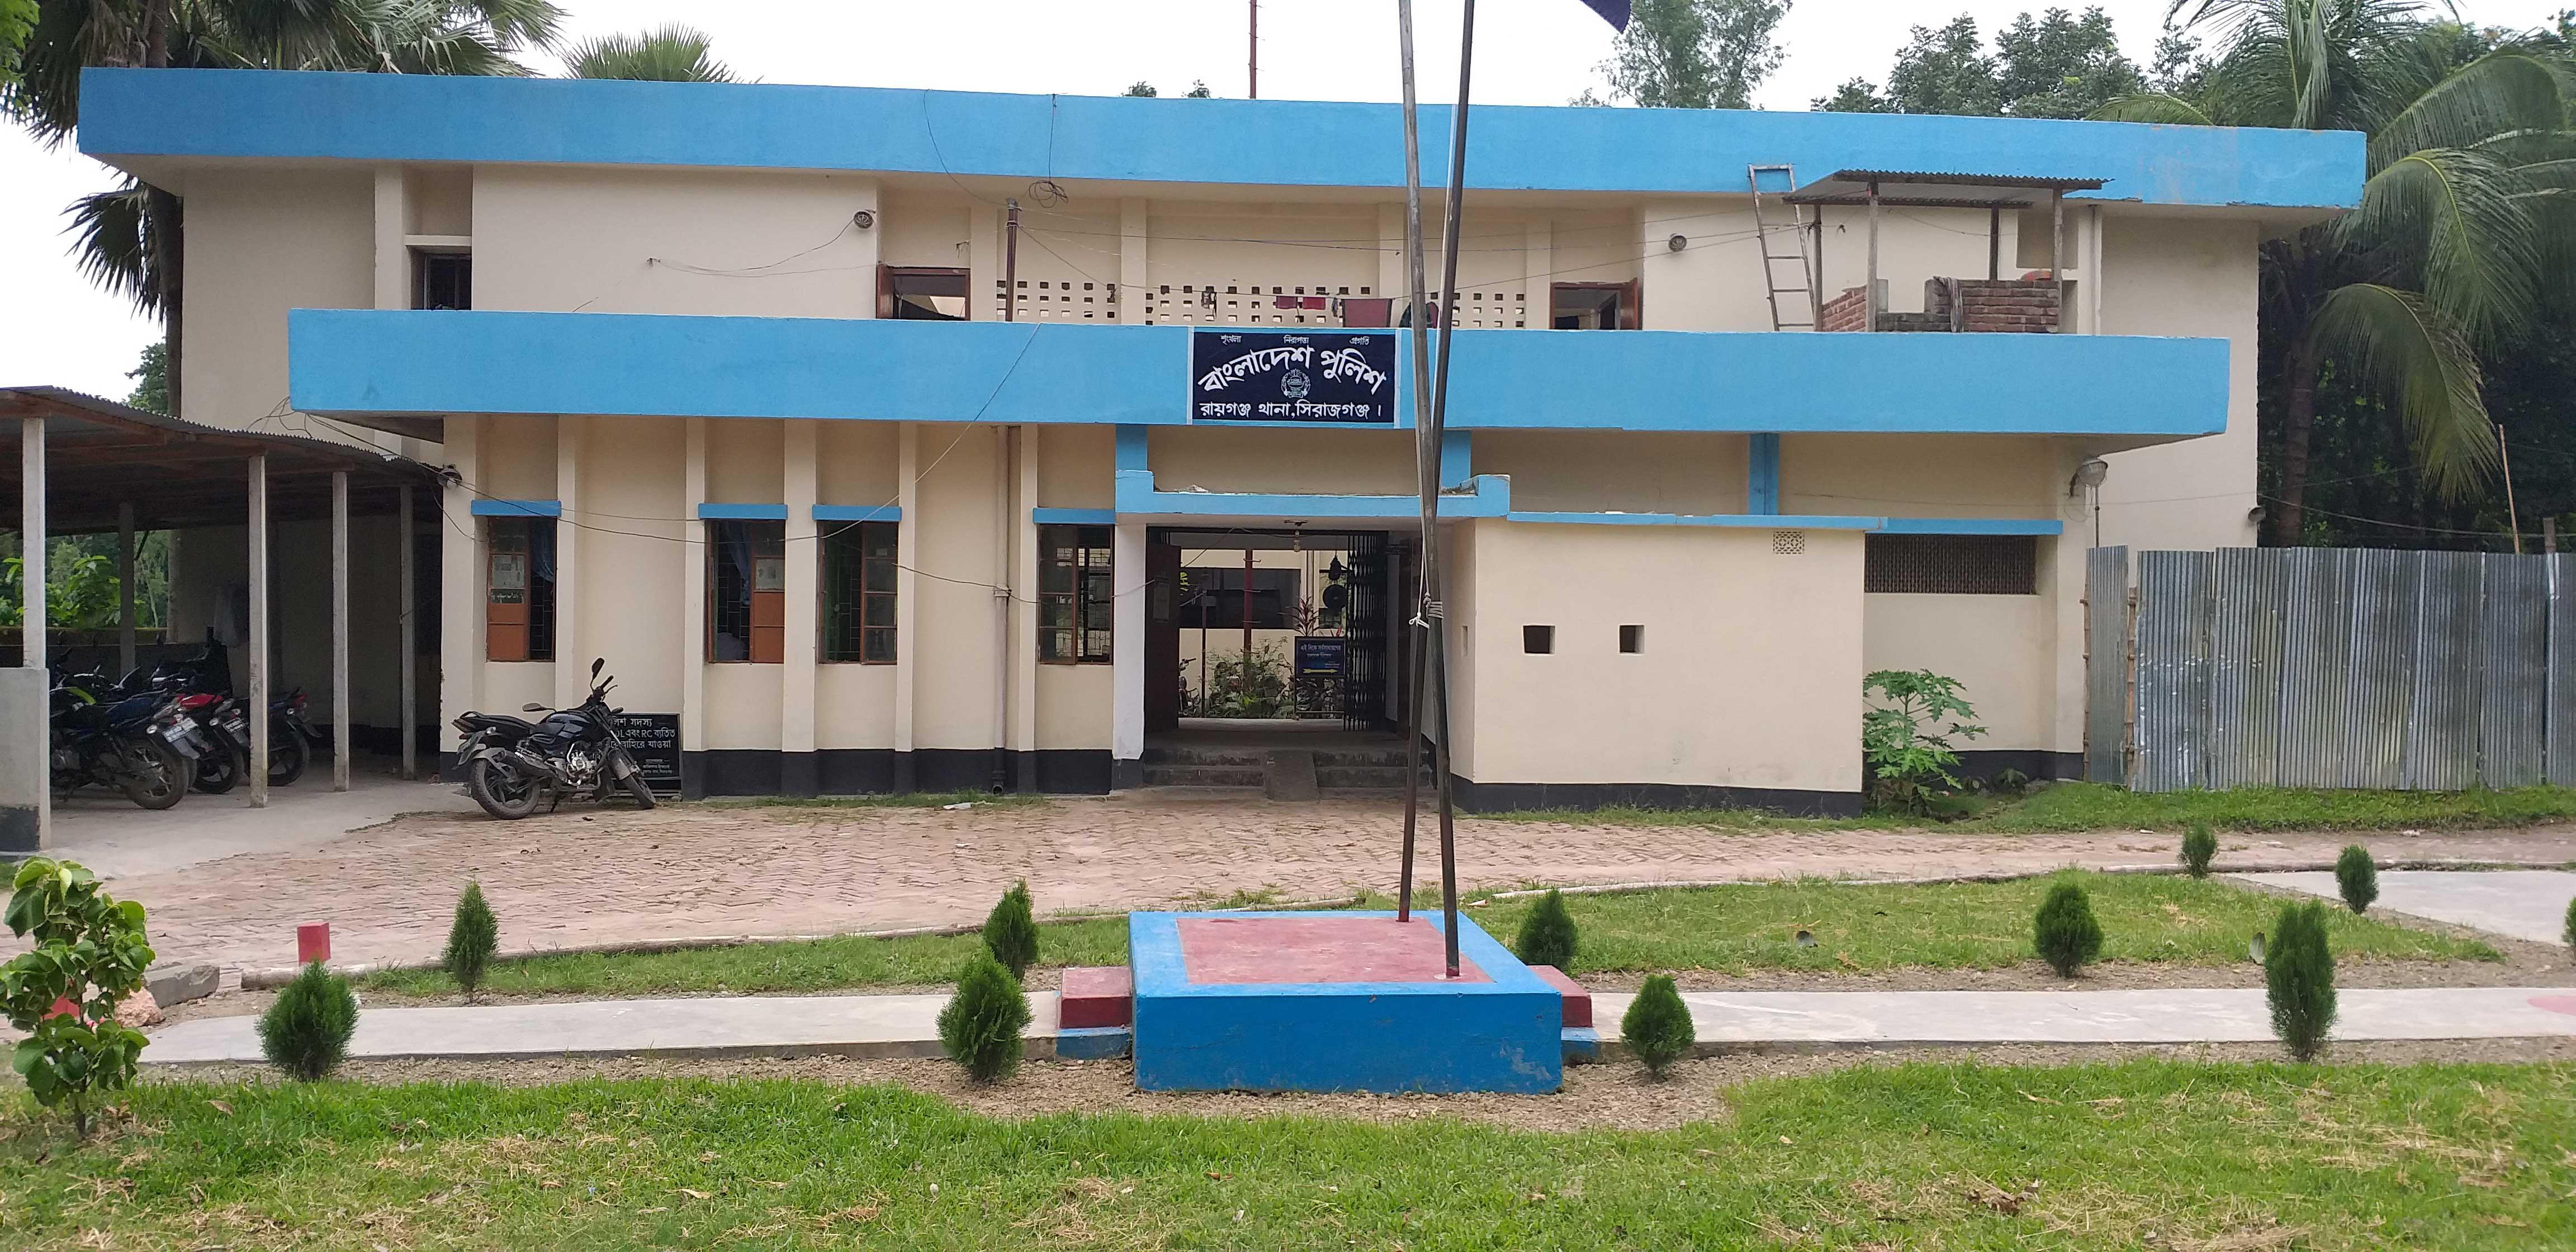 Police Station Image